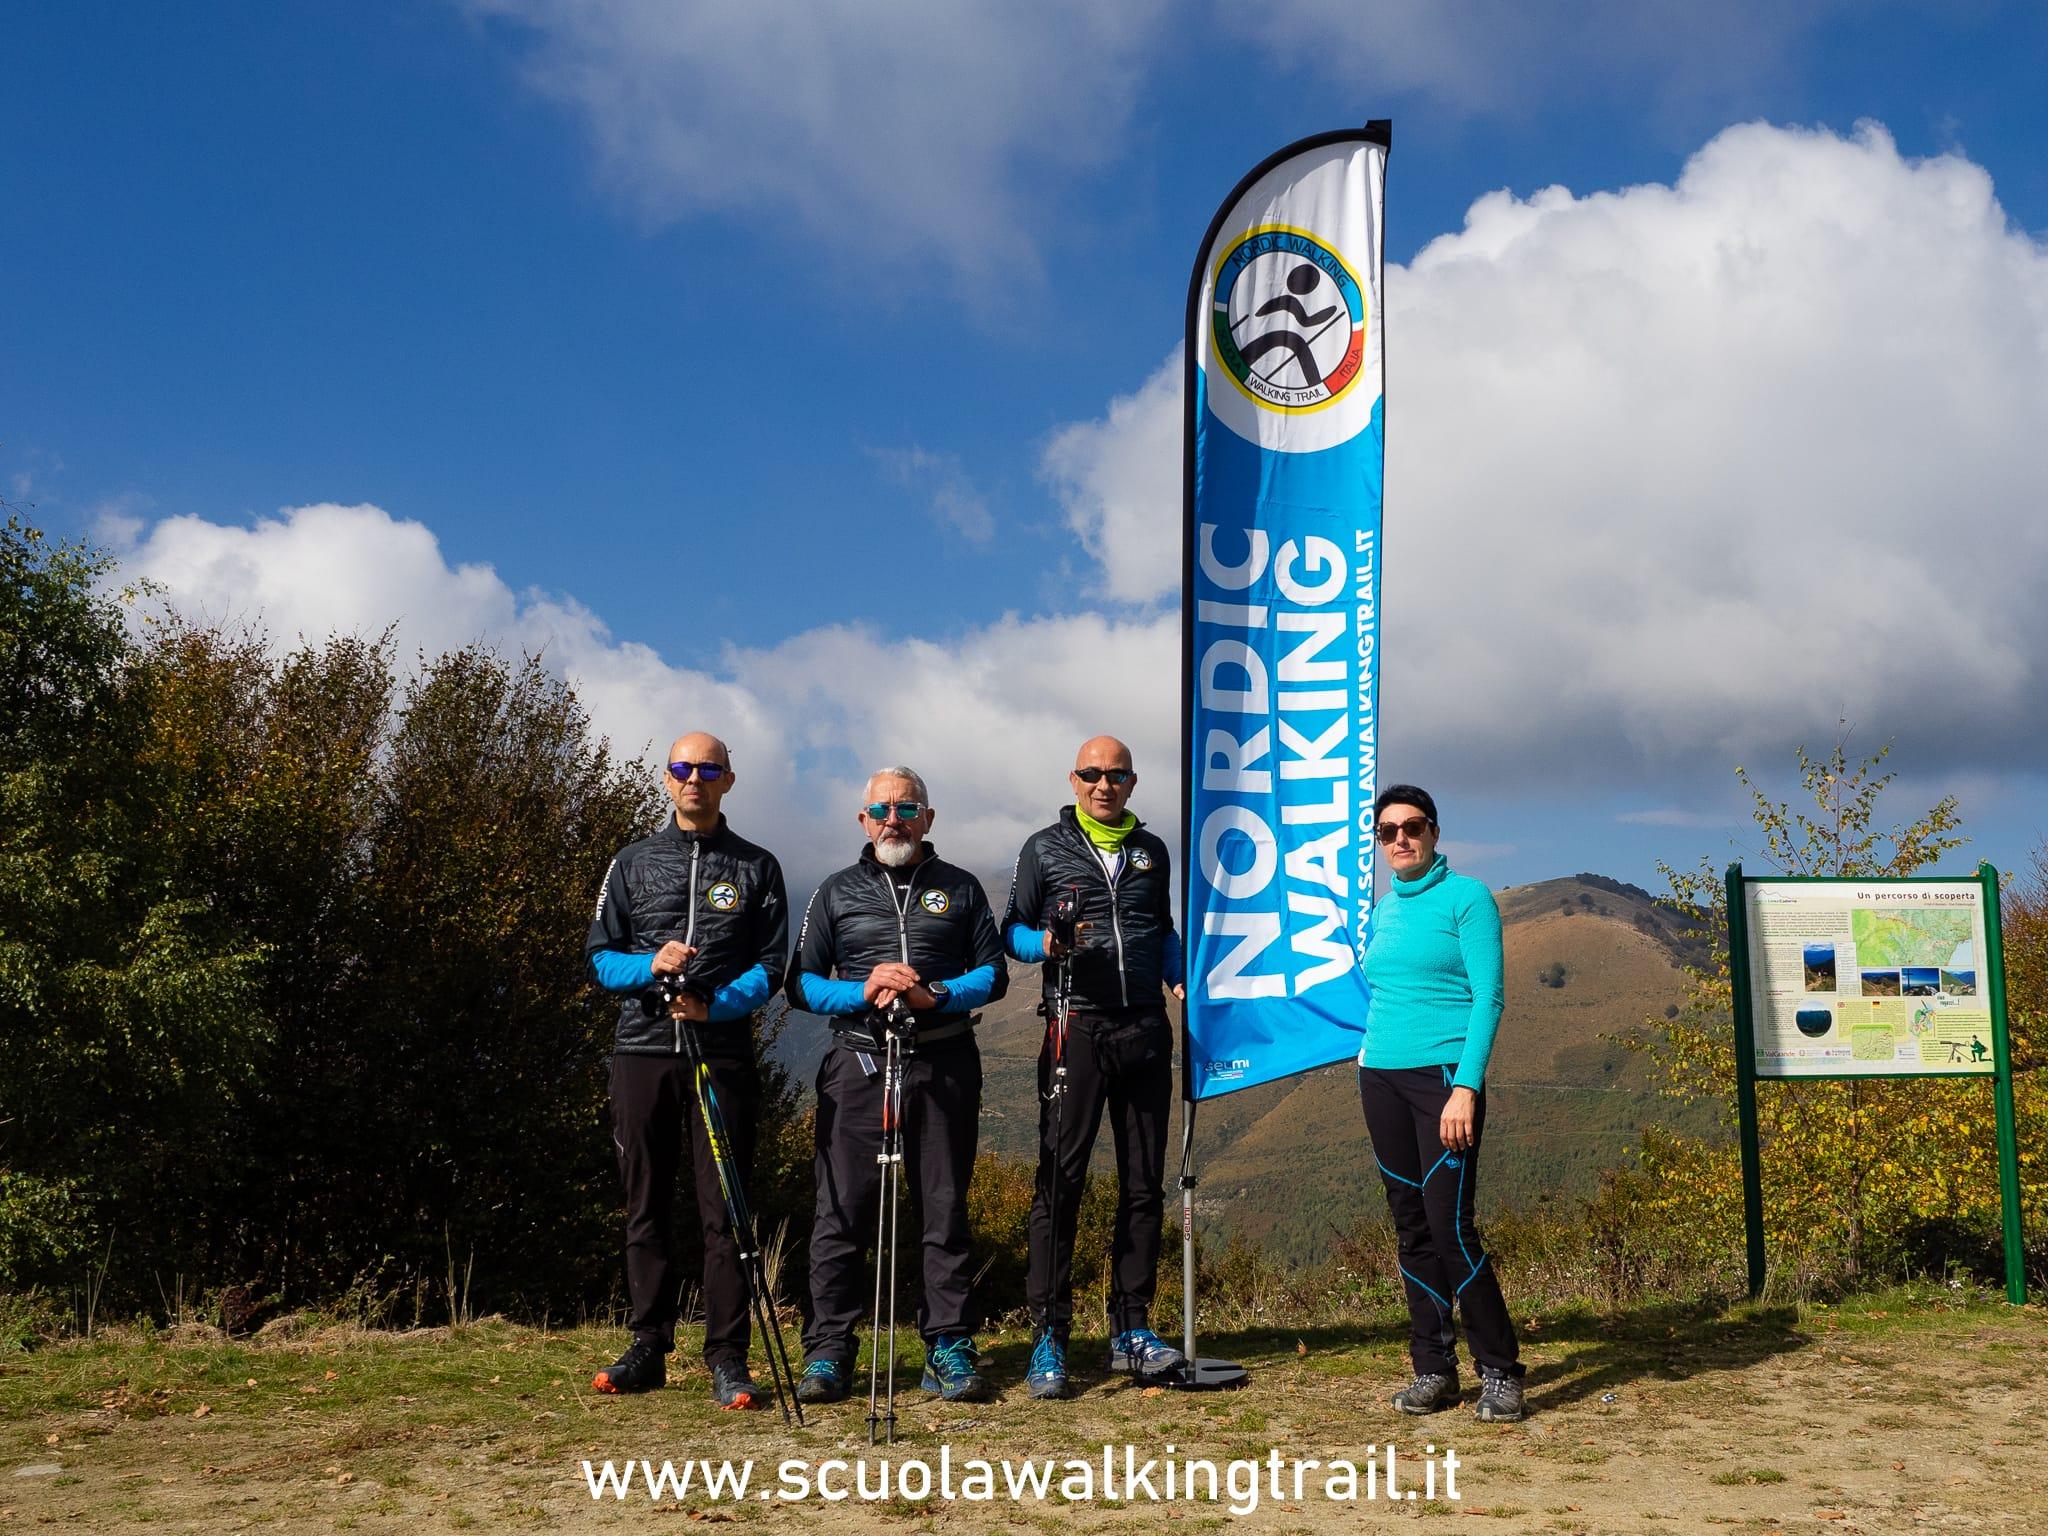 Consiglio Direttivo Scuola Walking Trail Italia: Albert Husband, Angelo Spera, Roberto Fontana, Emanuela Zecchin